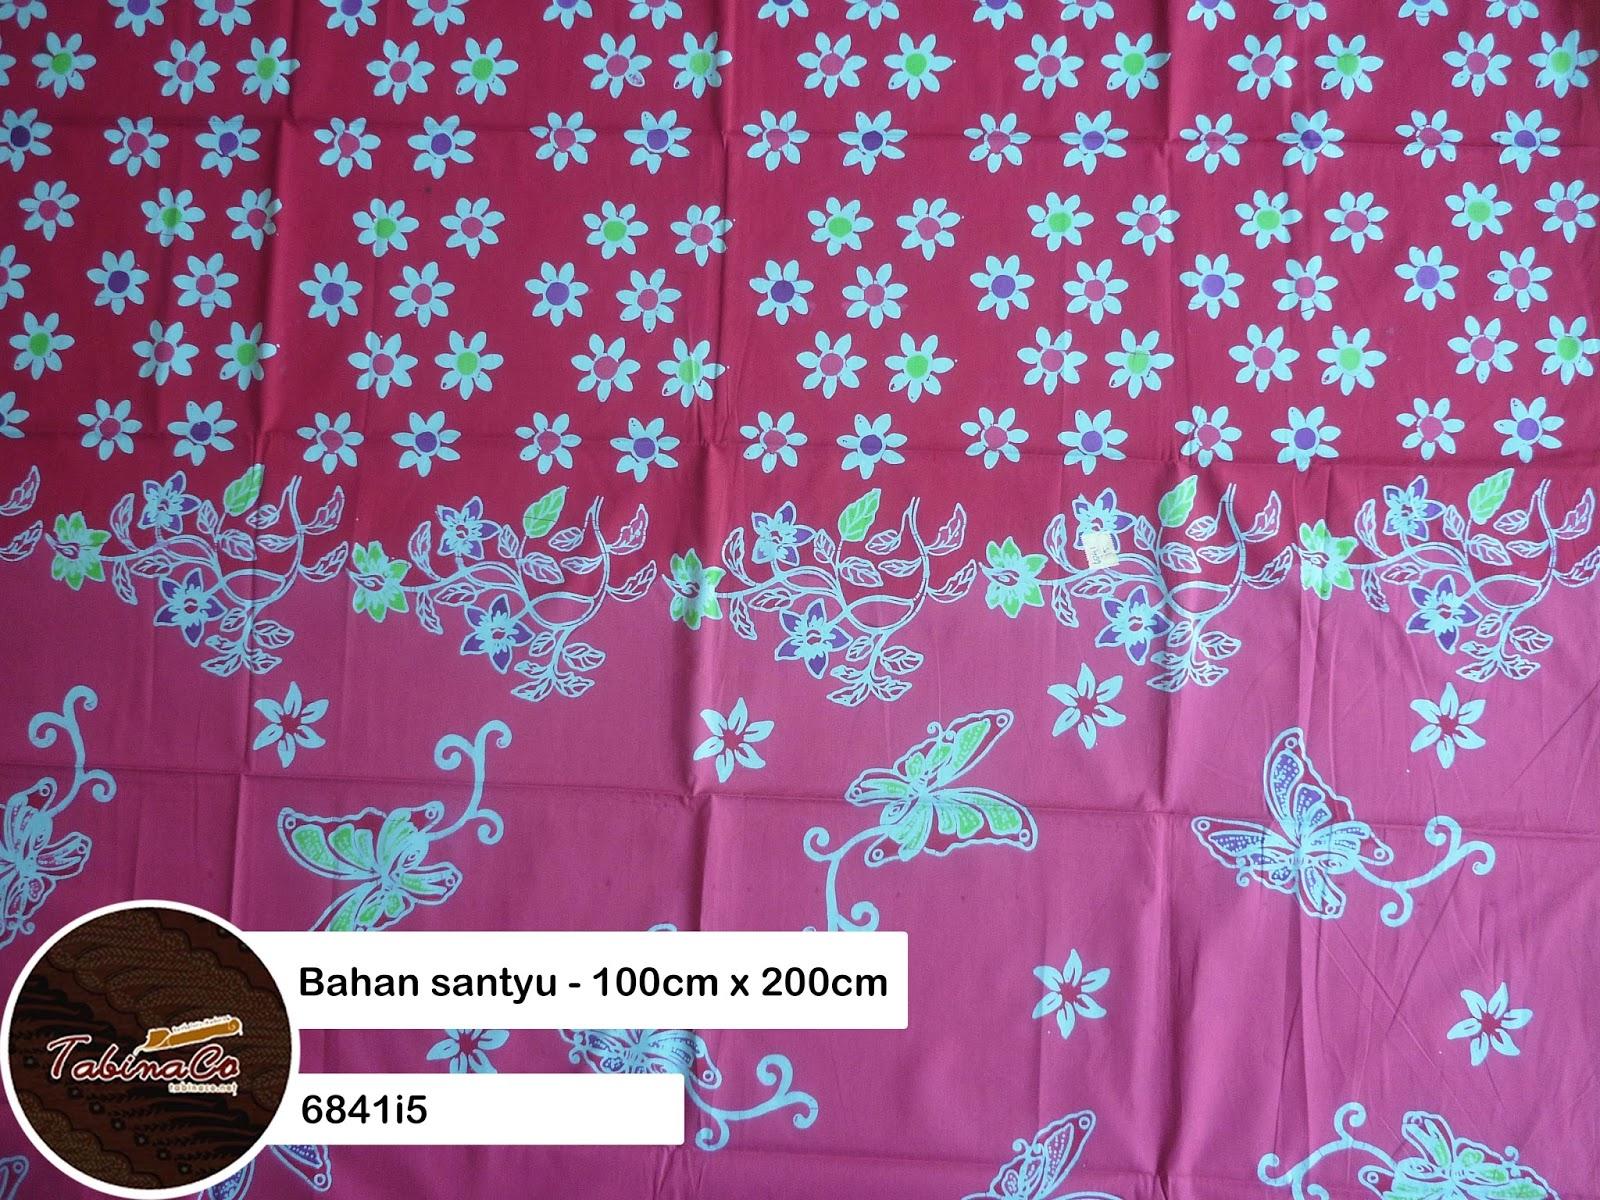 Grosir Kain Batik Madura Murah  tabinaco batik madura